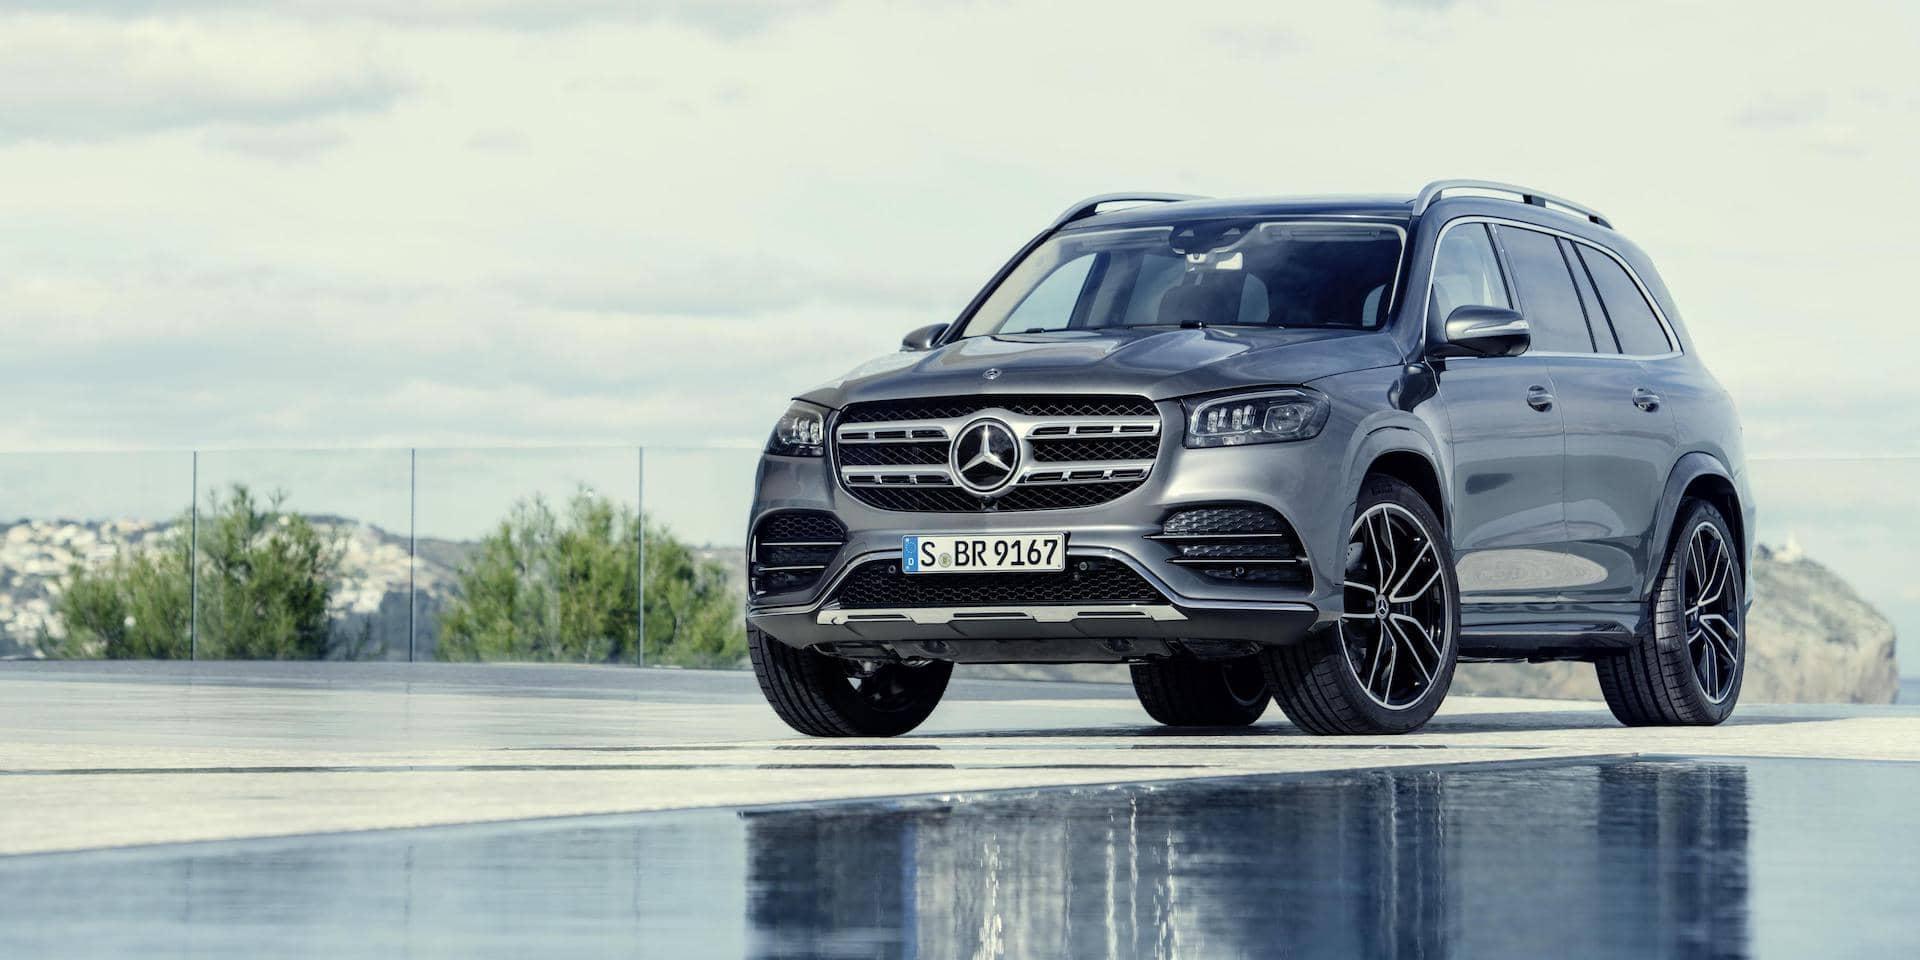 2019 Mercedes-Benz GLS 01   The Car Expert